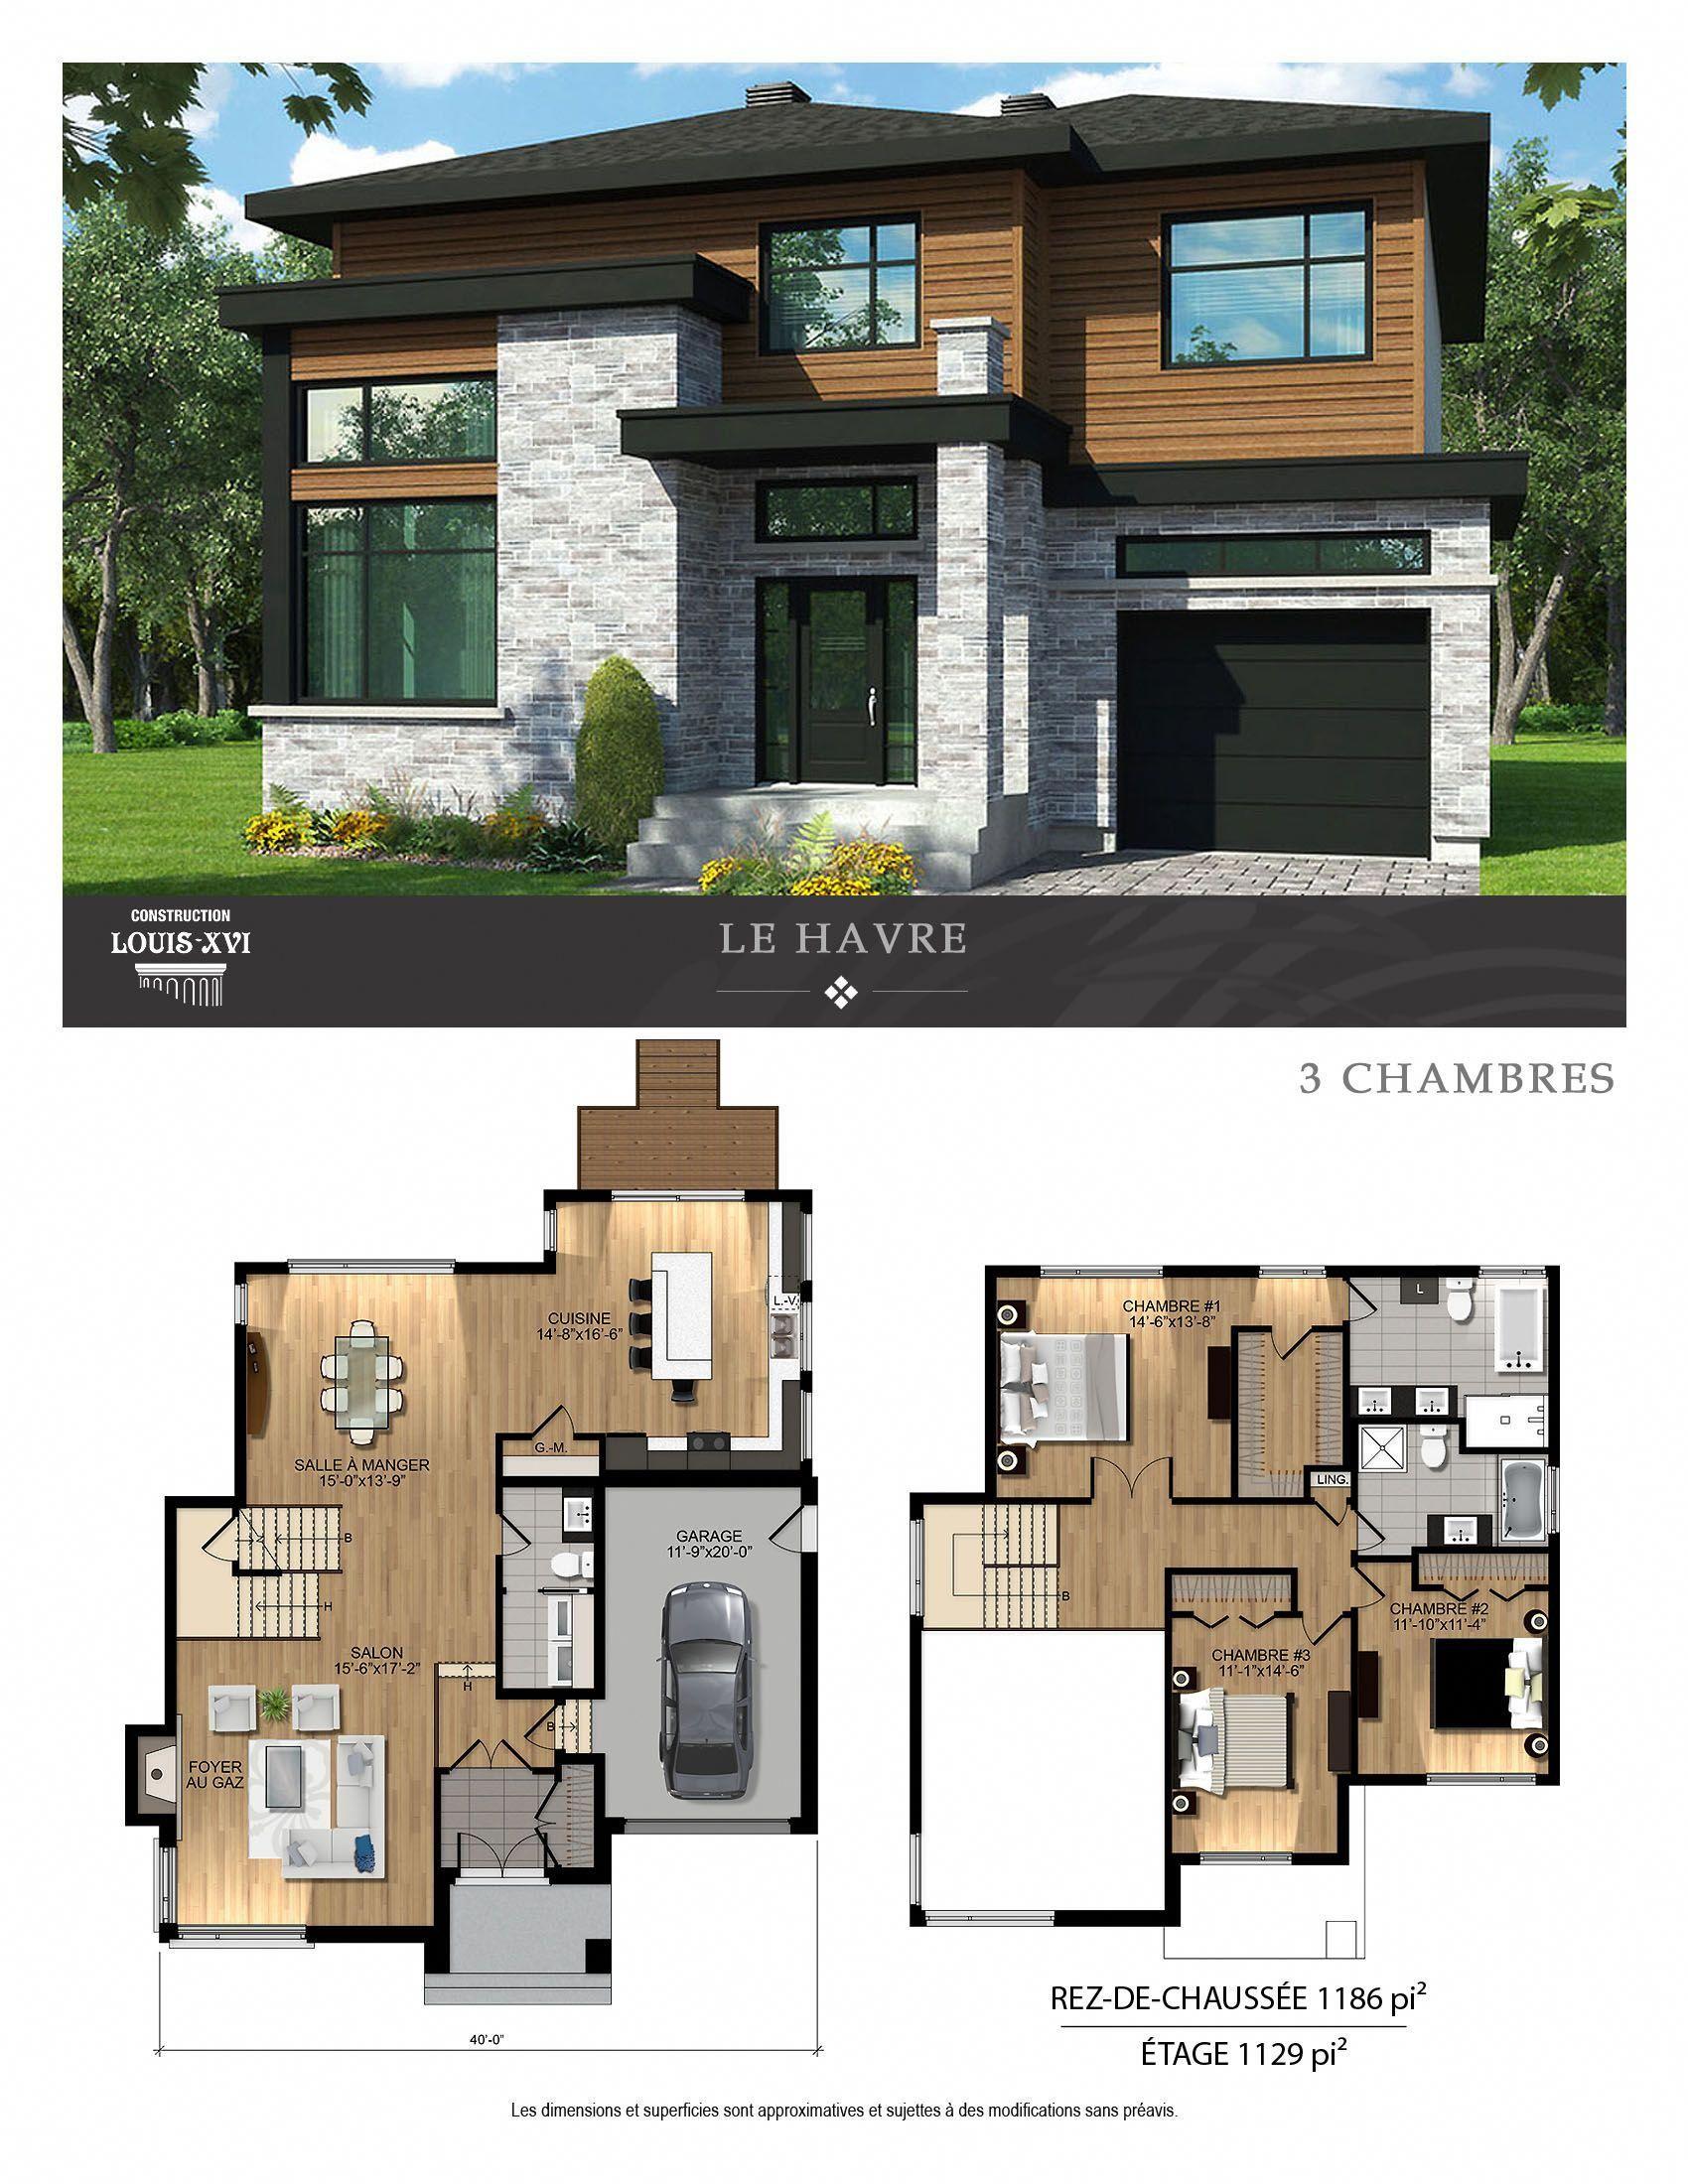 Modern Home Design Images Modernhomedesign Sims 4 Modern House Modern House Floor Plans Sims House Design